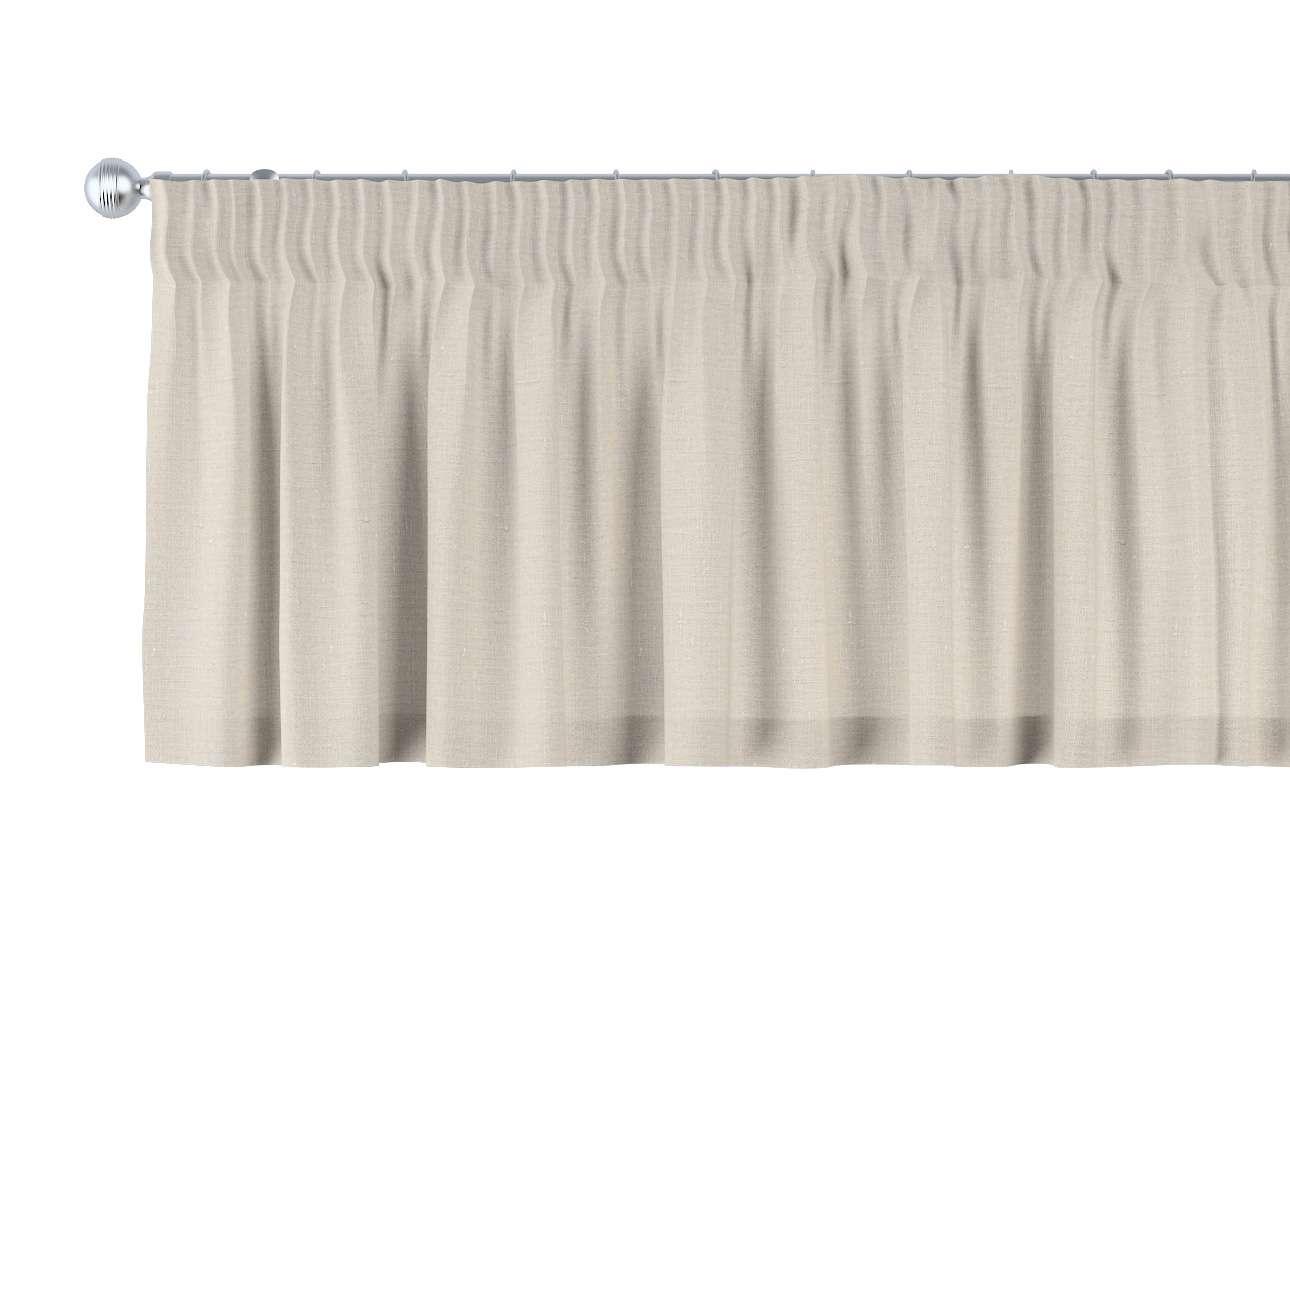 Gardinkappa med rynkband 130 × 40 cm i kollektionen Linne, Tyg: 392-05